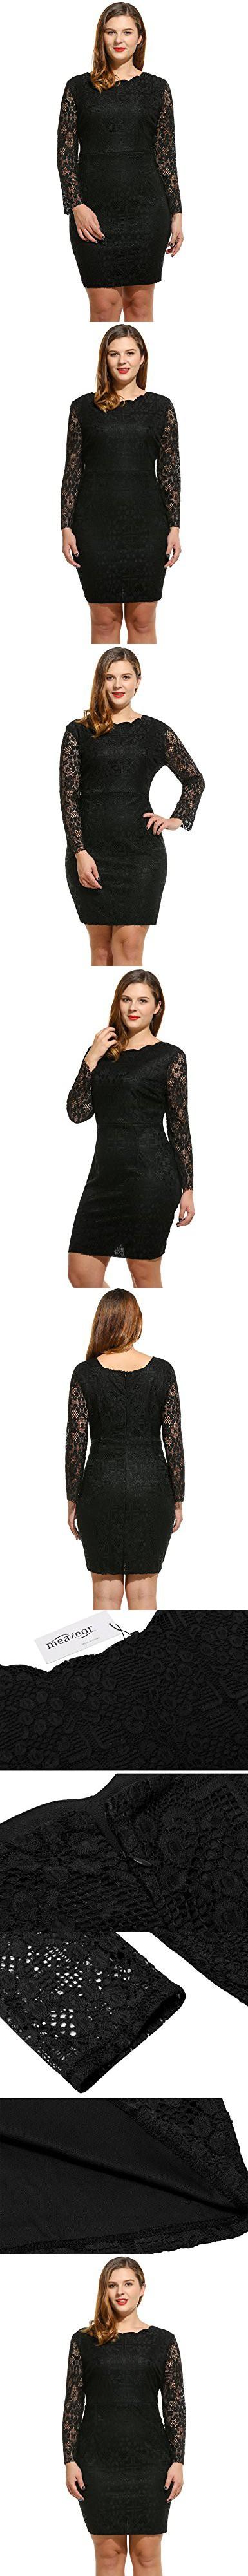 Meaneor women plus size long sleeve lace dress cocktail dress black